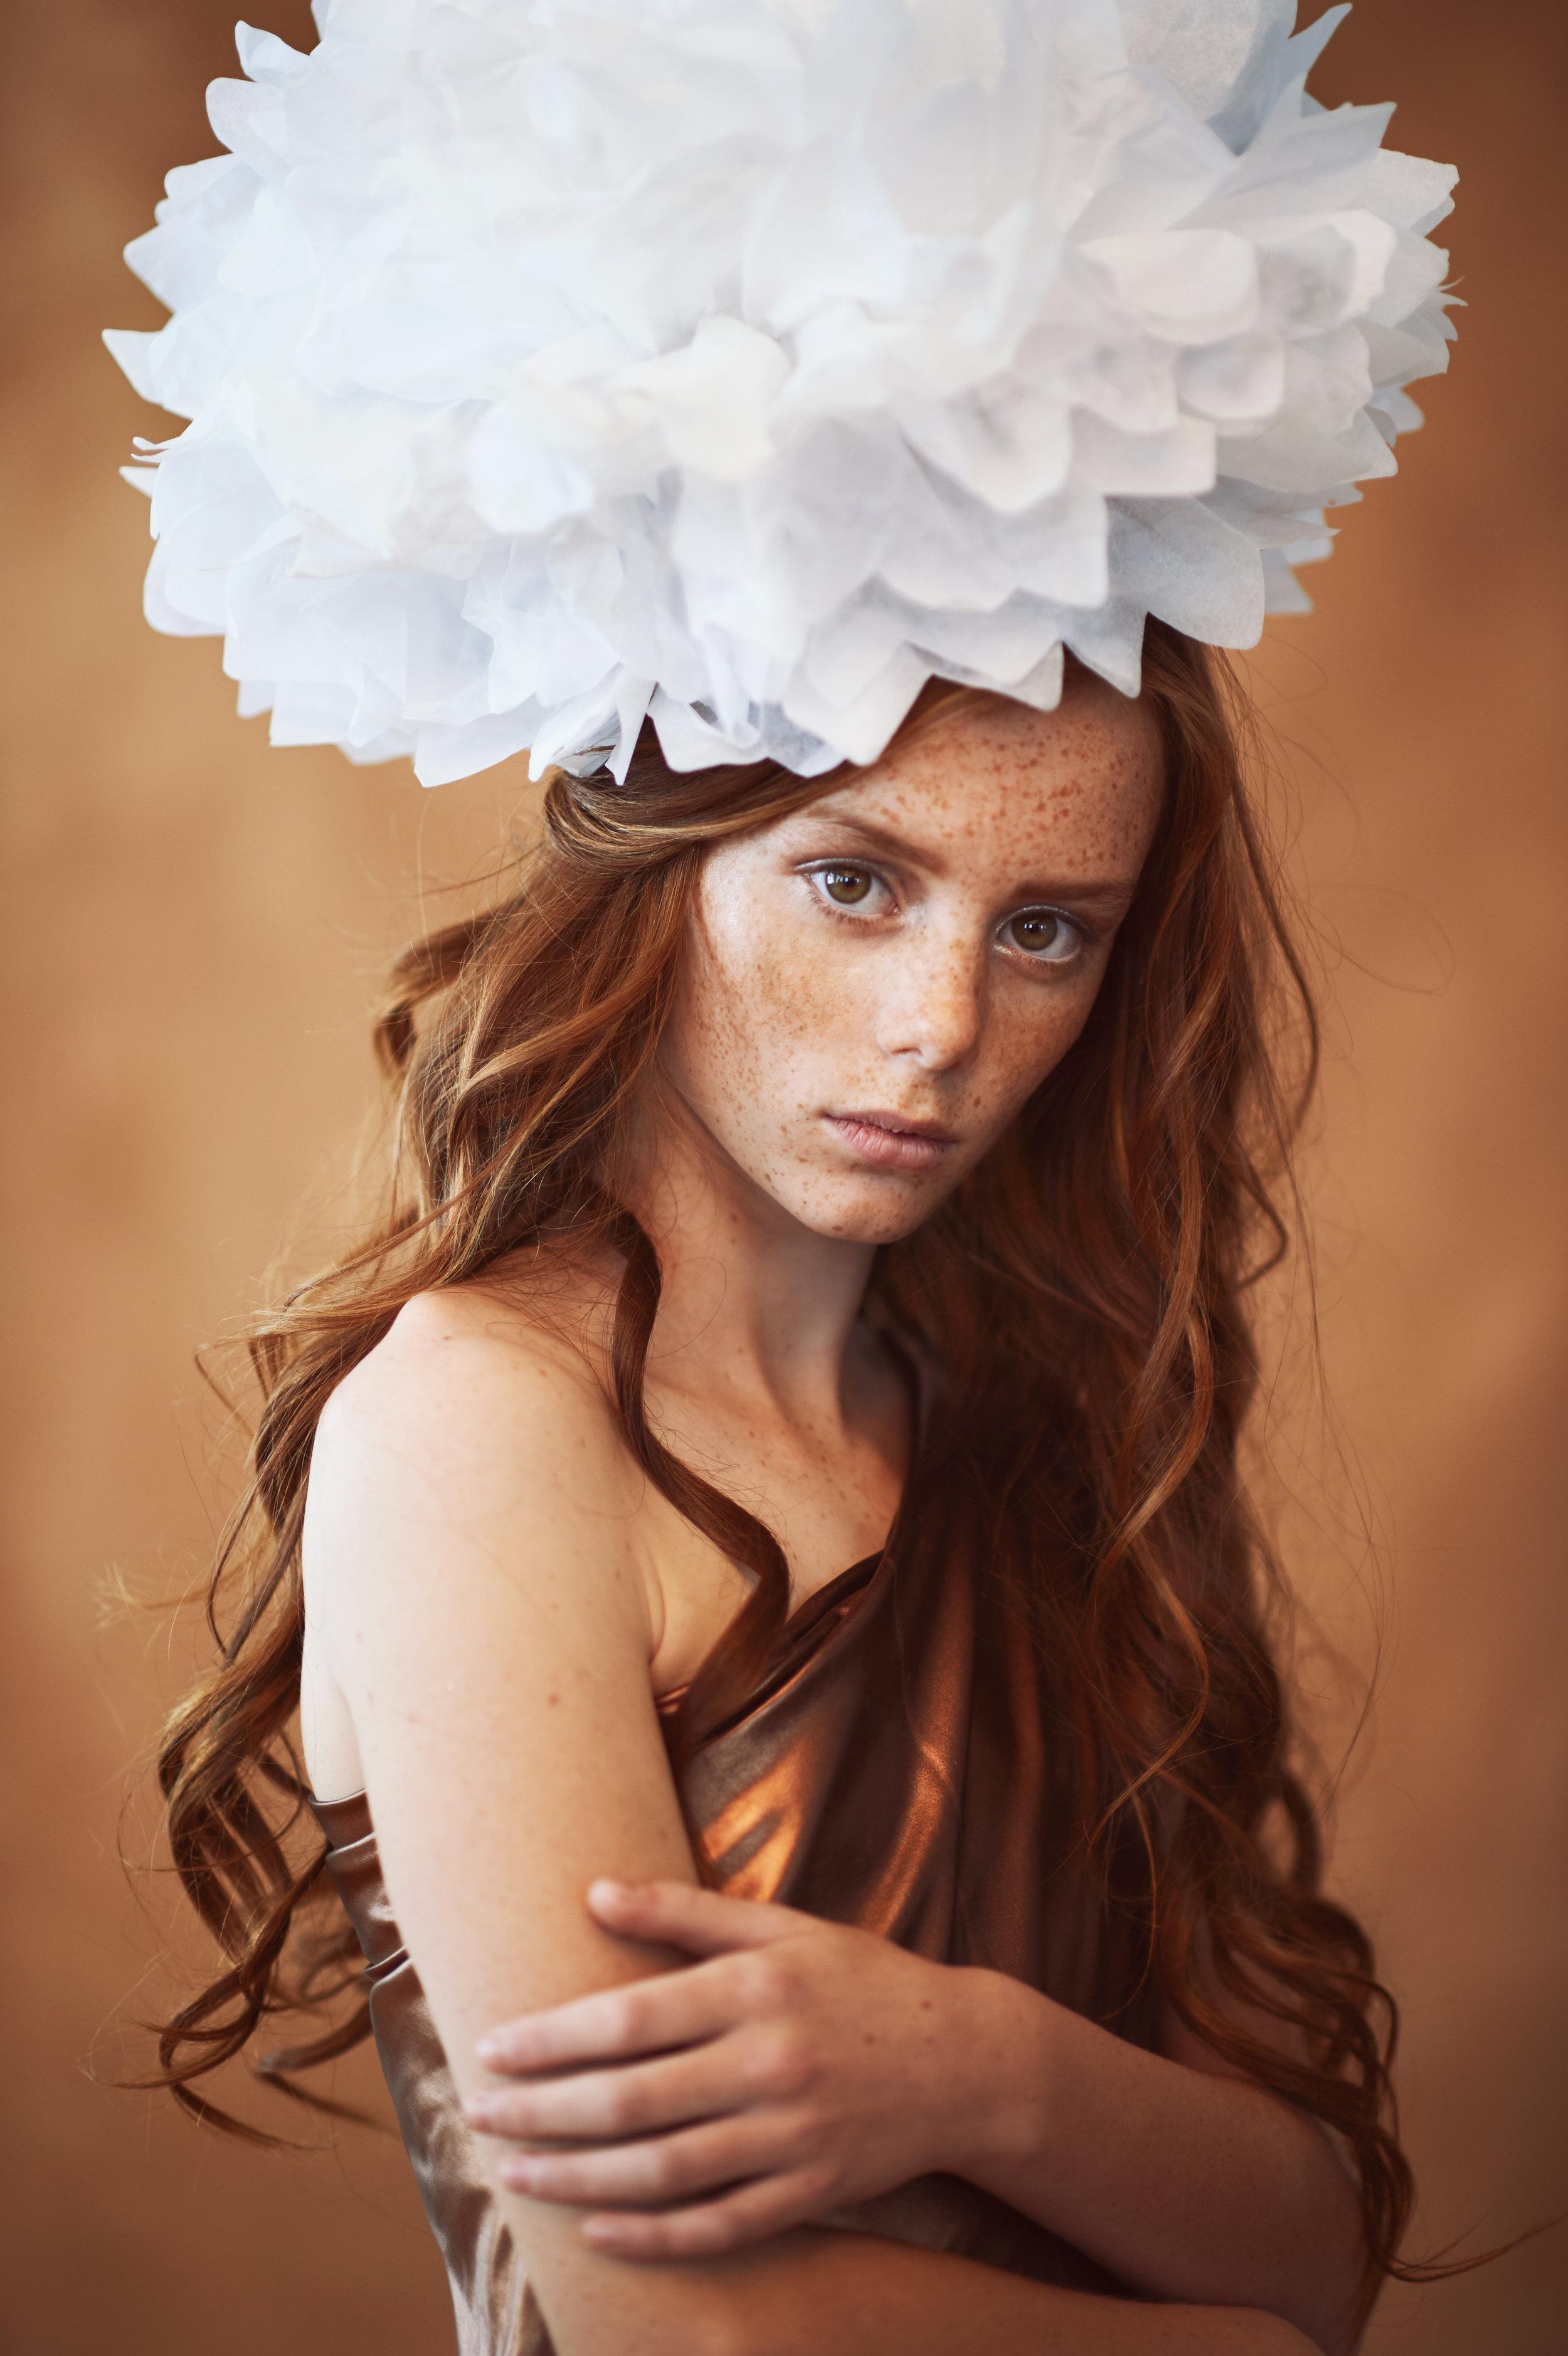 Marta-hewson-Emeryss-Teen-Portrait-Fashion-shoot-copper dress - white orament in hair.jpg